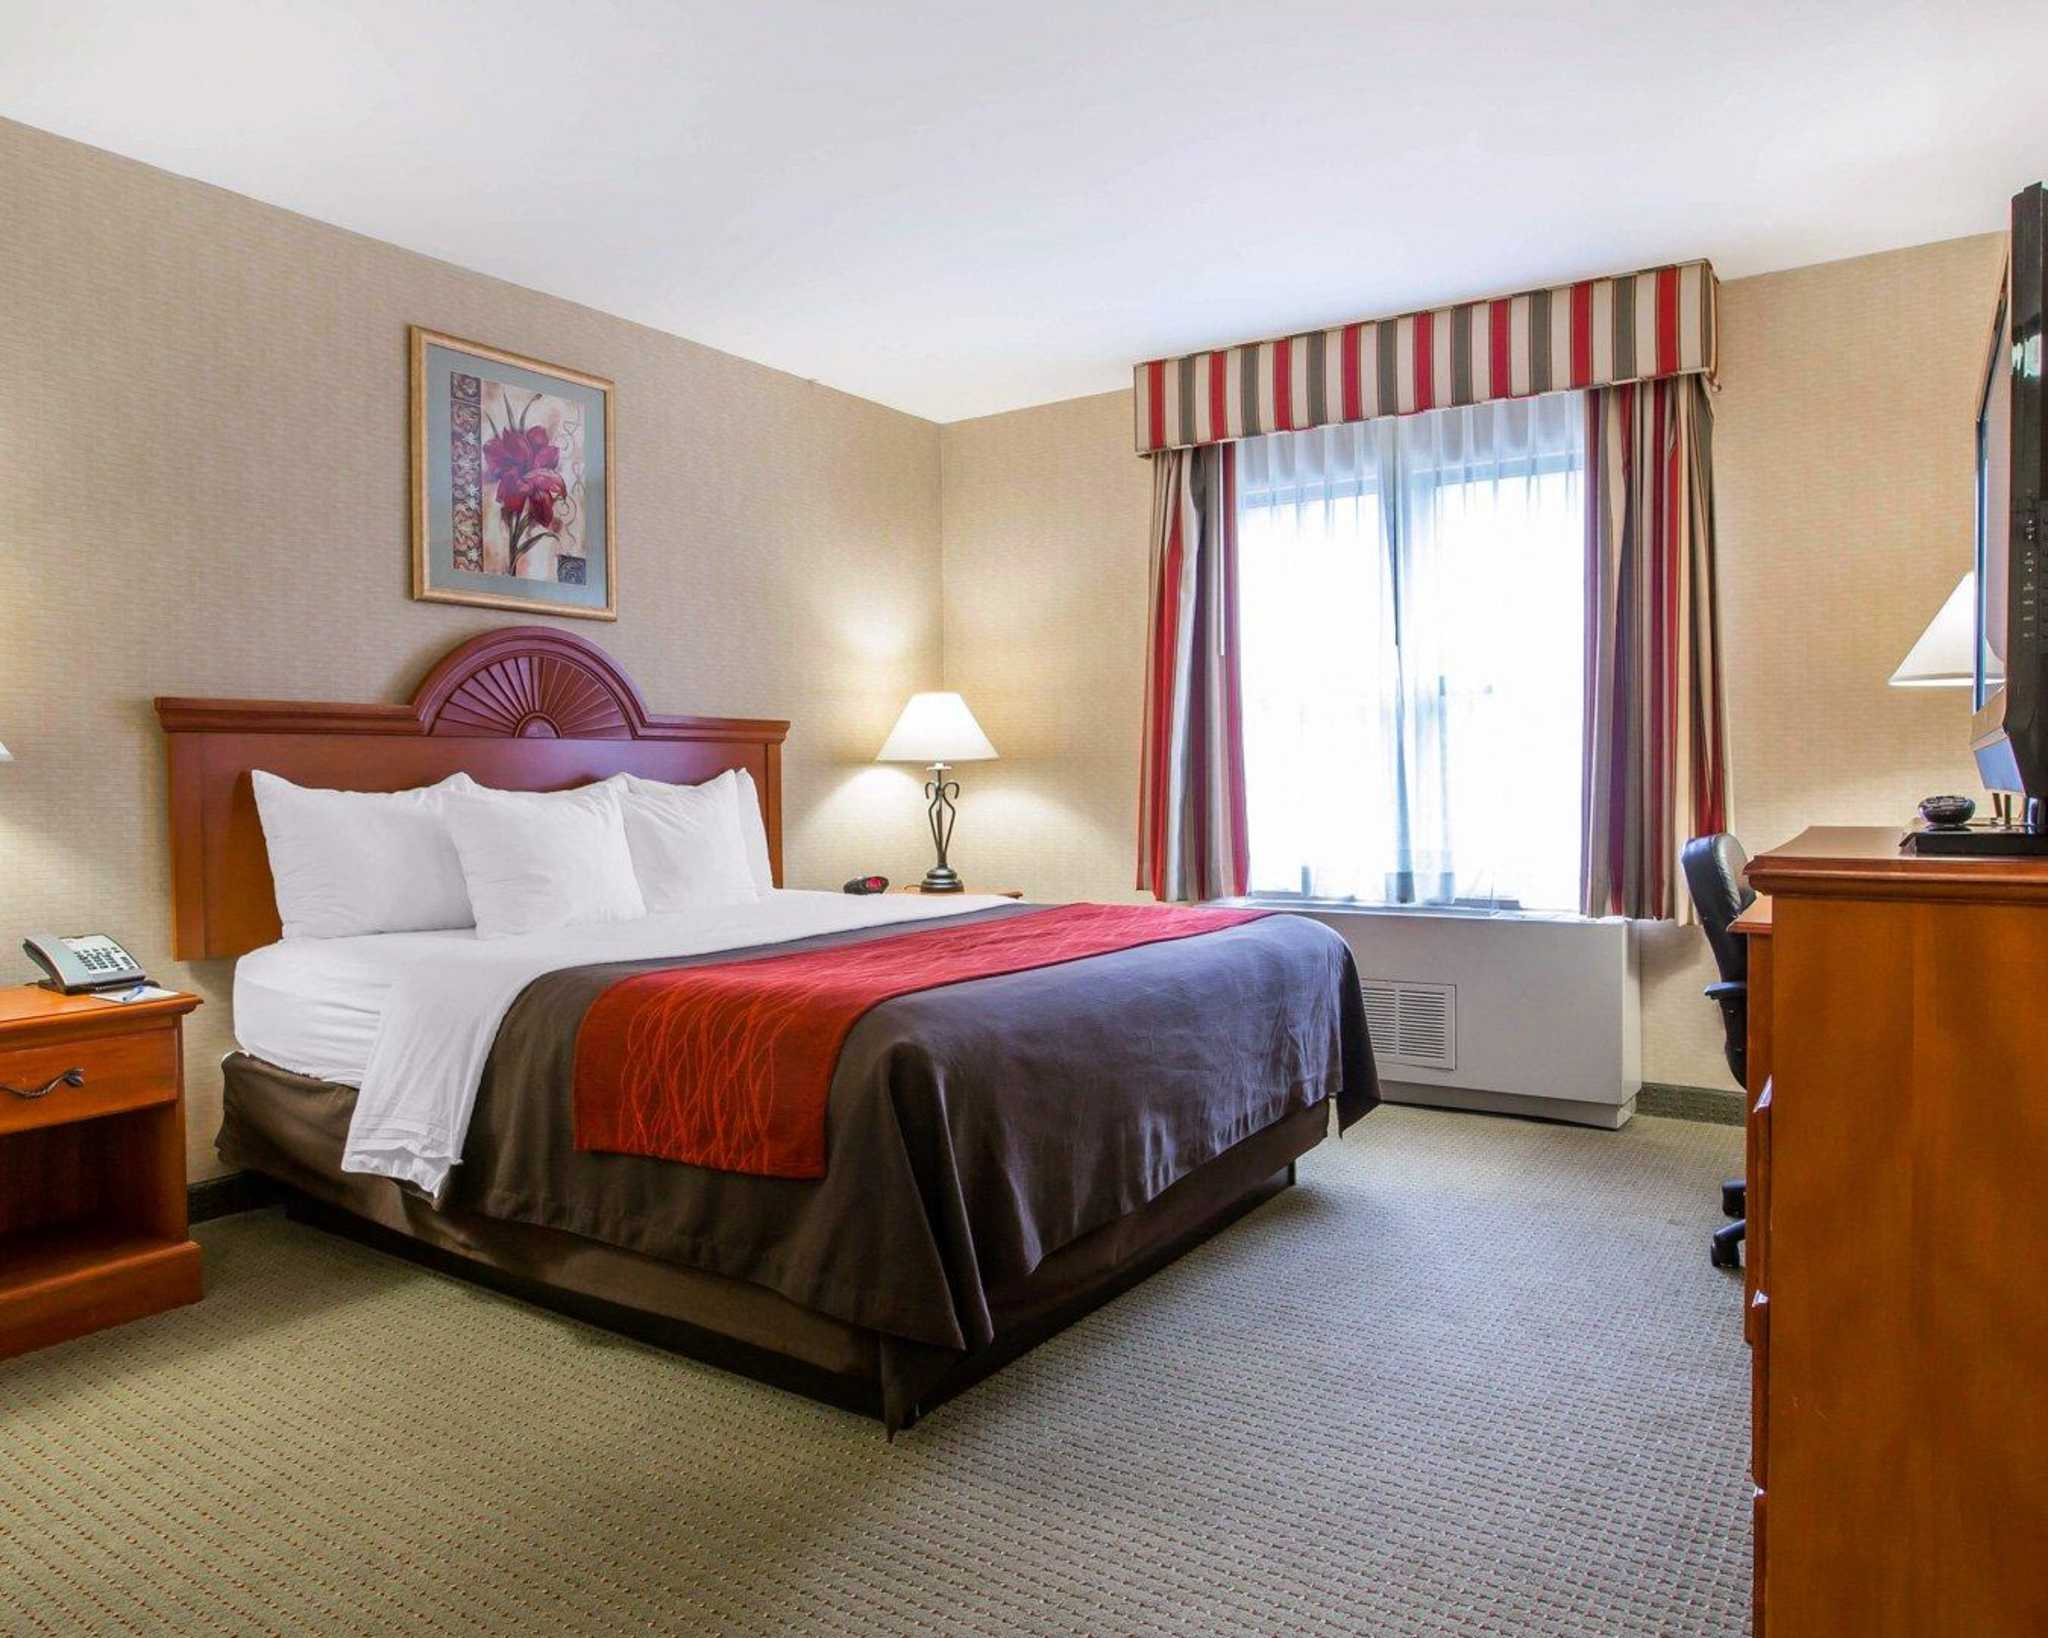 Comfort Inn & Suites adj to Akwesasne Mohawk Casino image 9